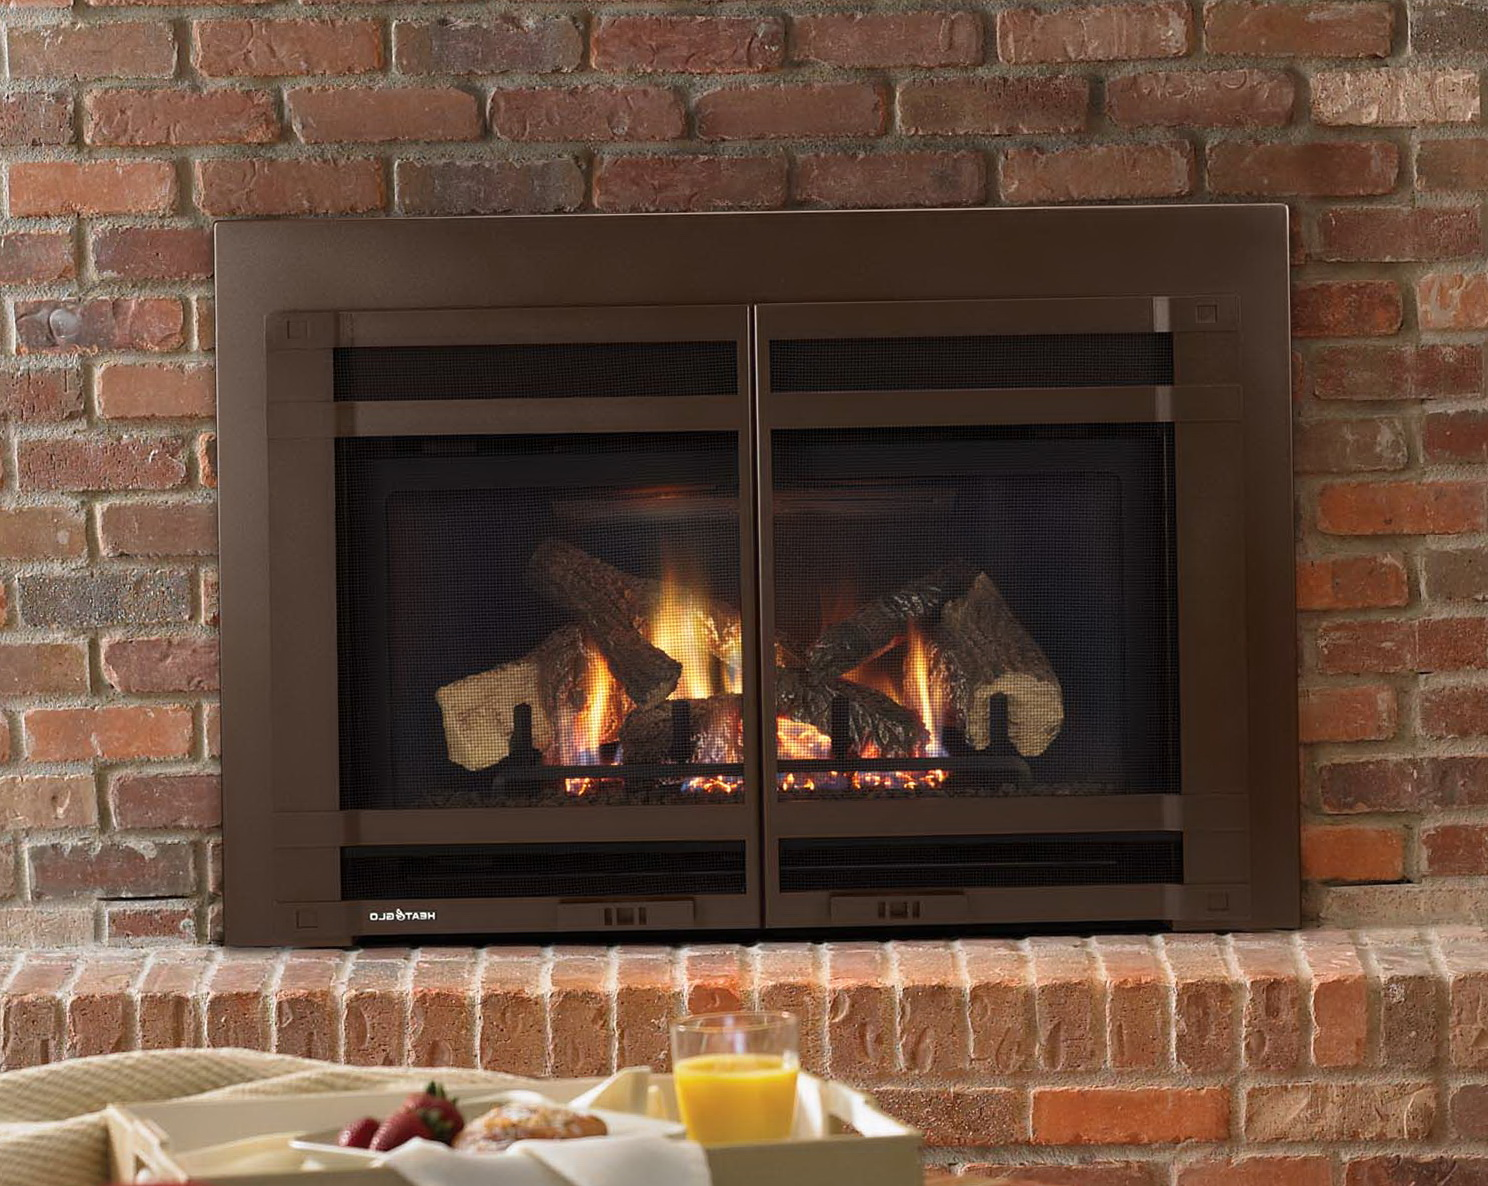 Heatilator Gas Fireplaces Troubleshooting Home Design Ideas